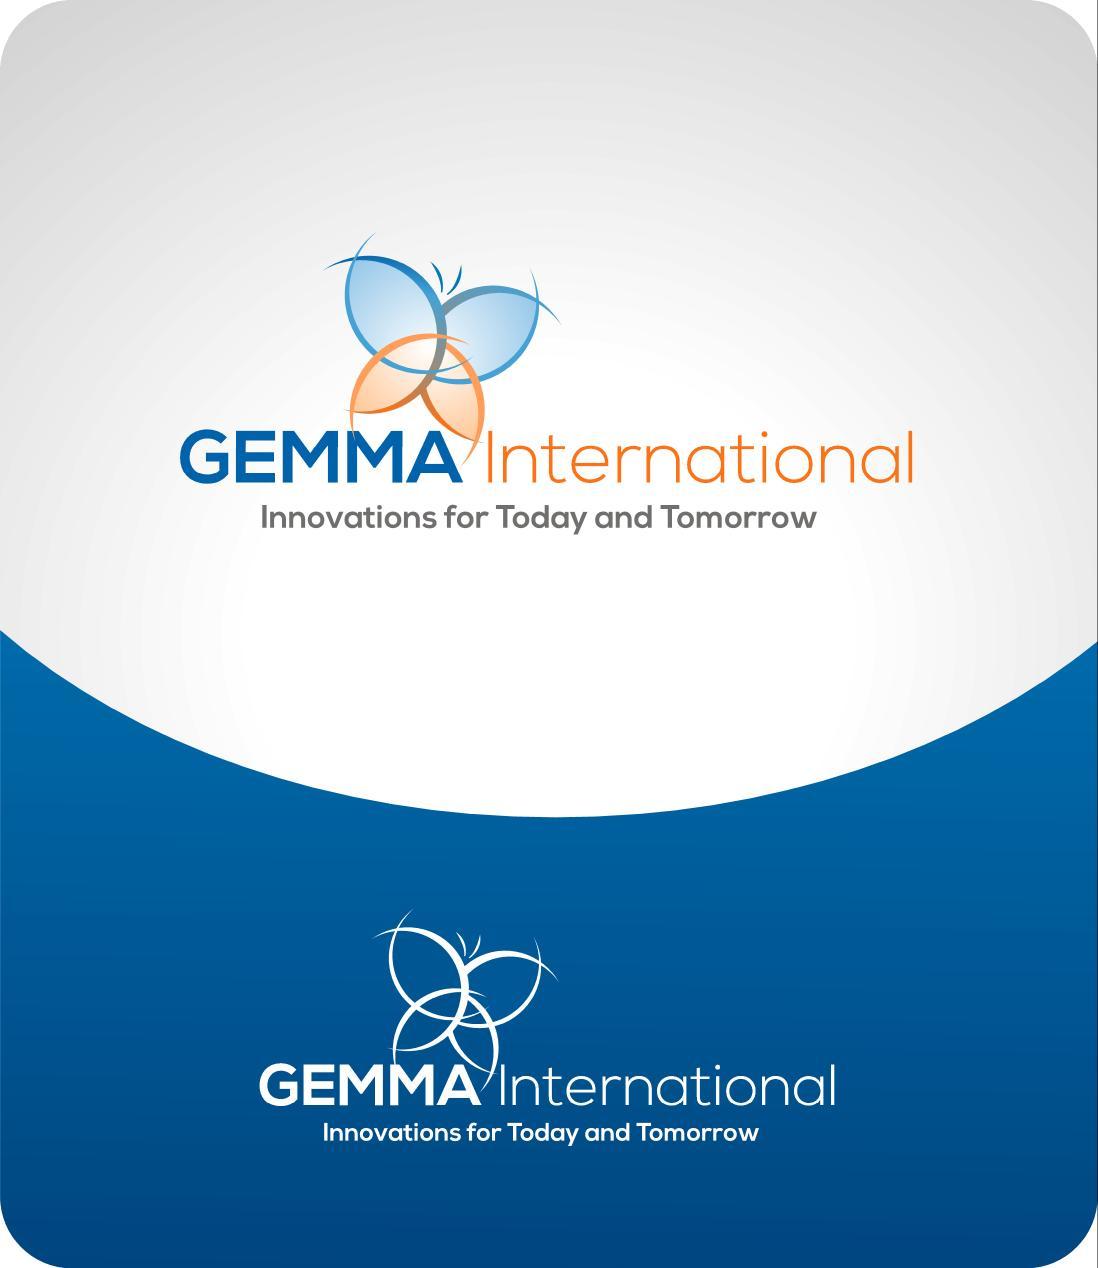 Logo Design by luvrenz - Entry No. 60 in the Logo Design Contest Artistic Logo Design for Gemma International.